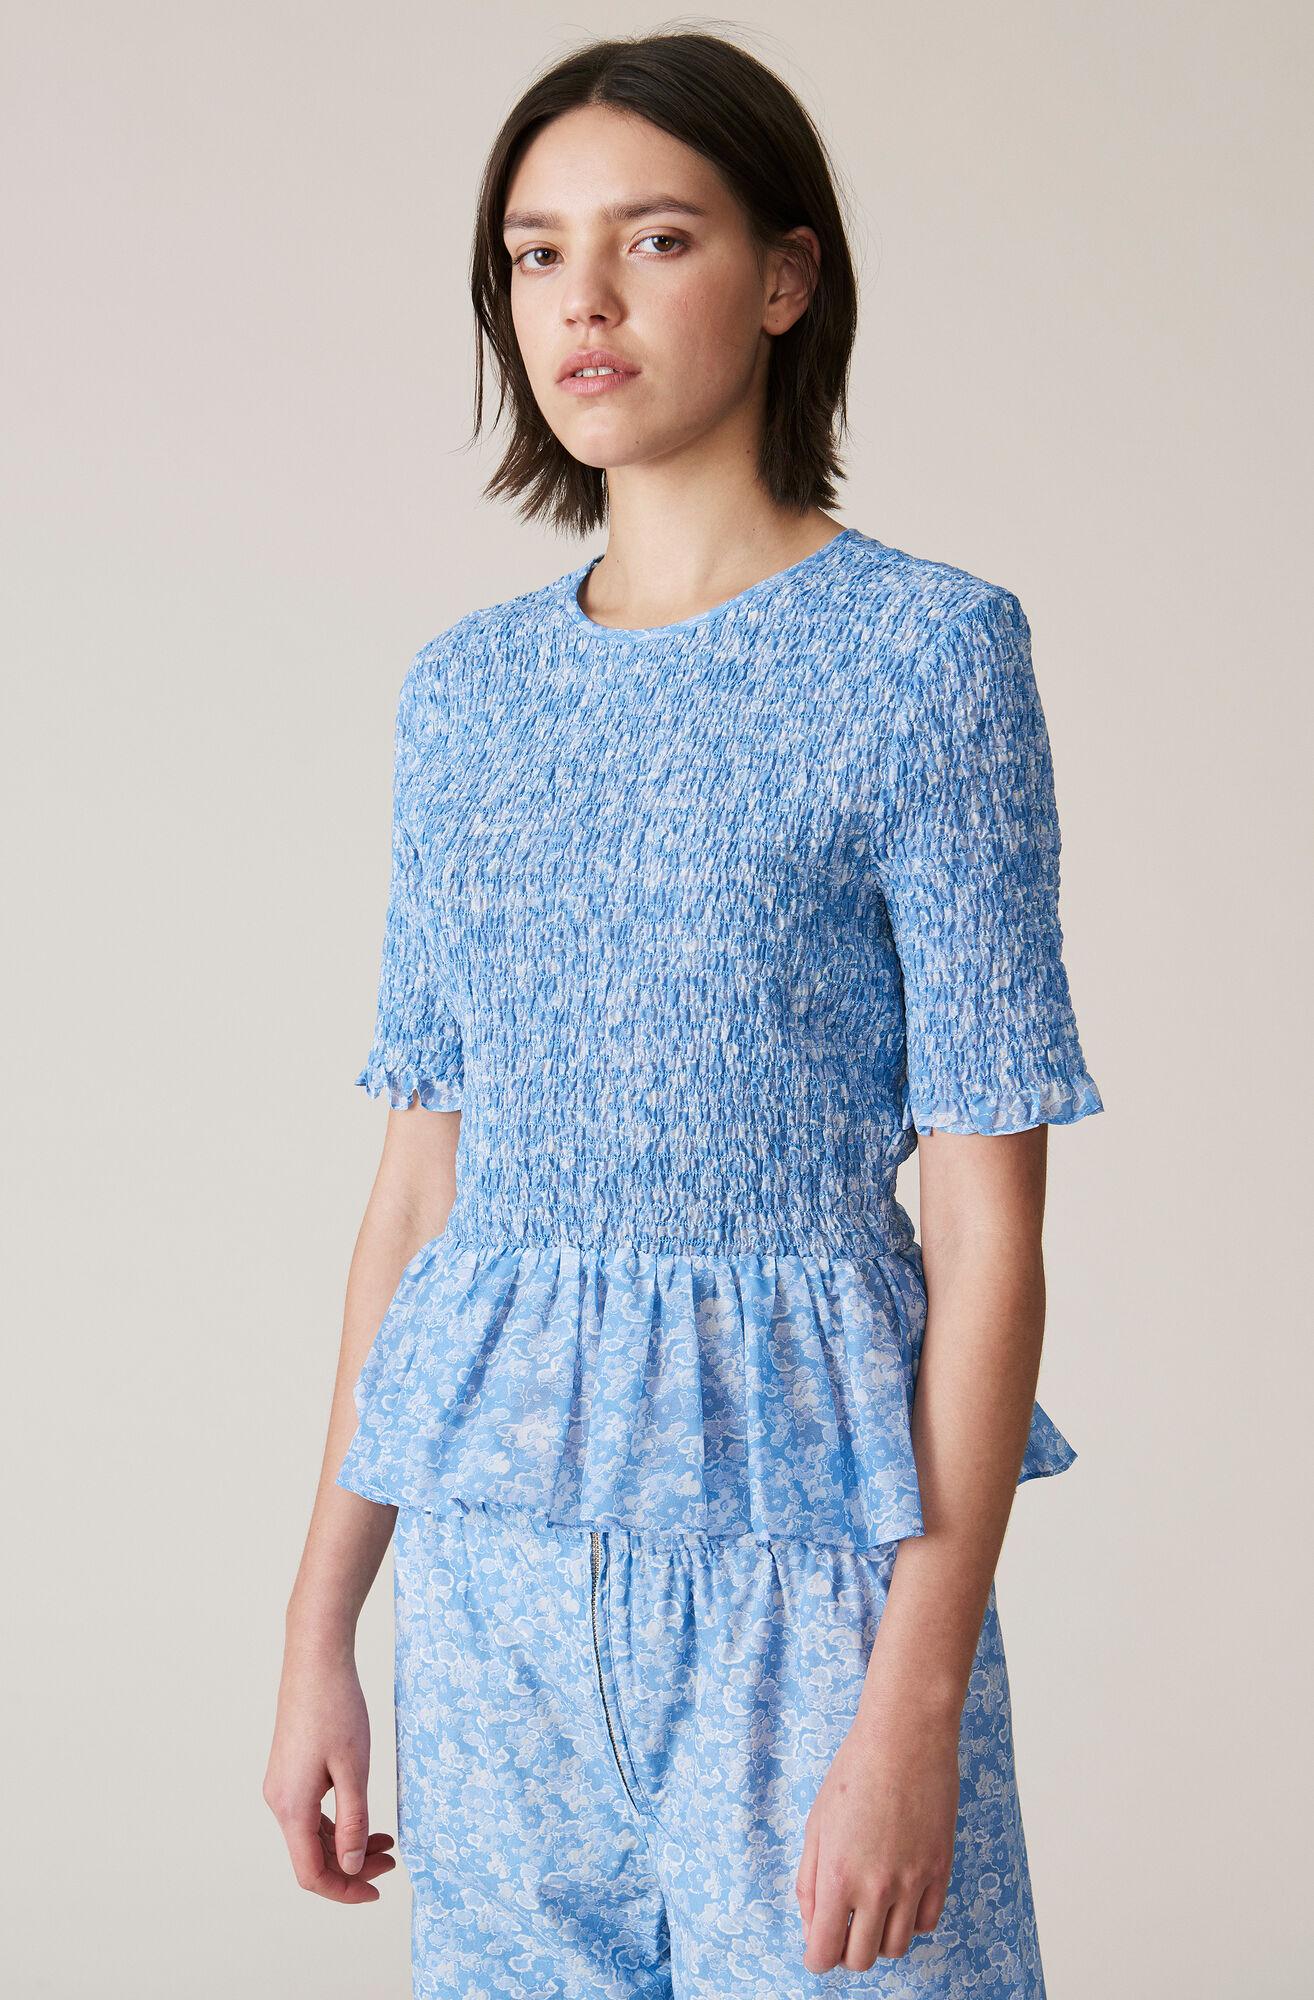 Linaria Blouse, Serenity Blue, hi-res